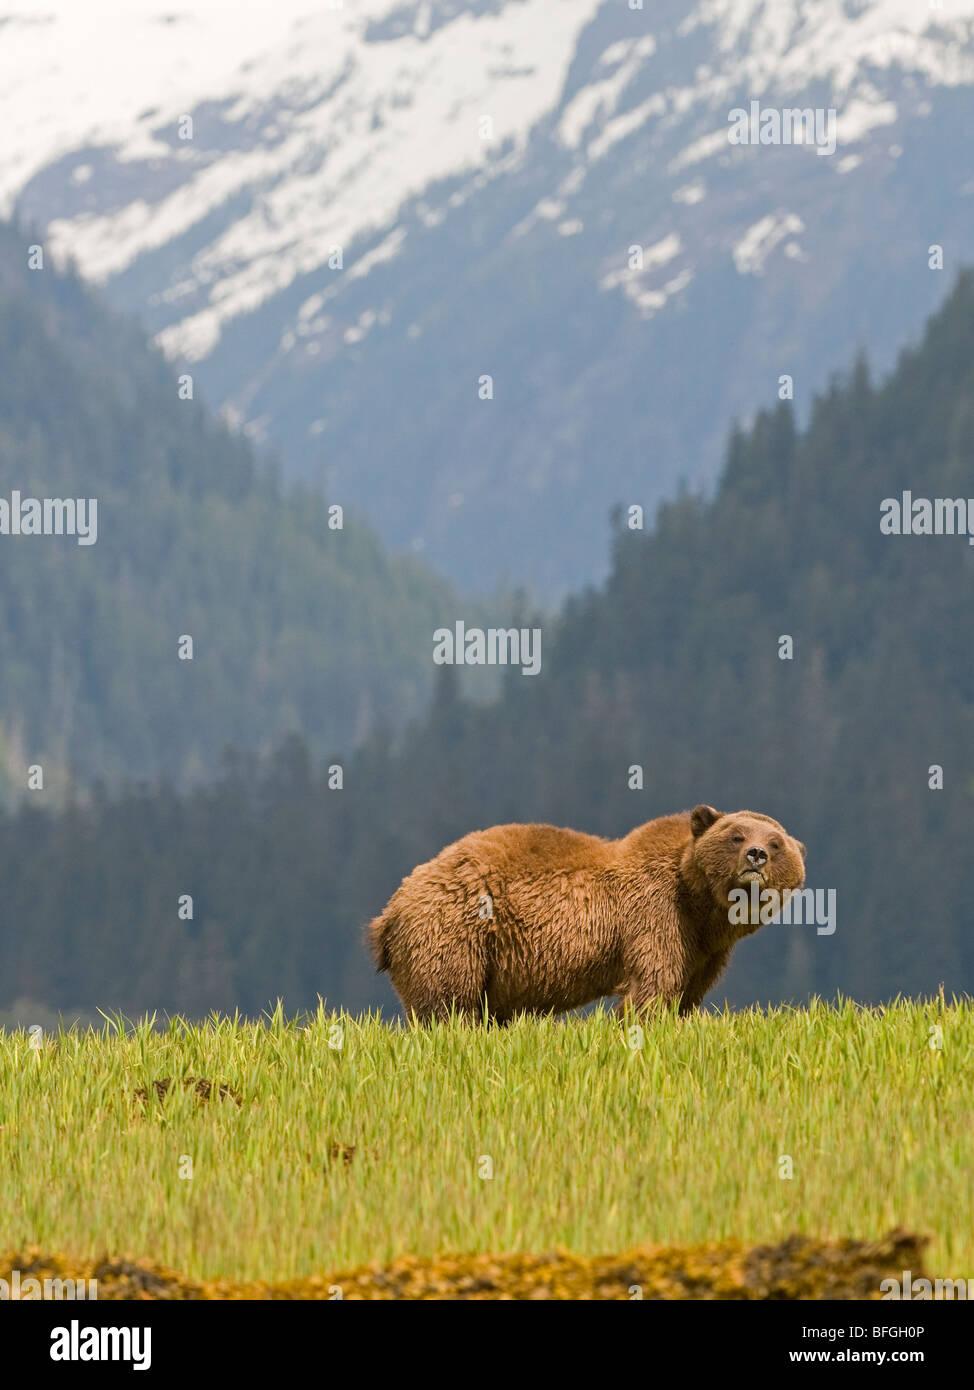 Male Grizzly Bear (Ursus arctos horribilis)  Khutzeymateen Grizzly Bear Sanctuary North of Prince Rupert British - Stock Image